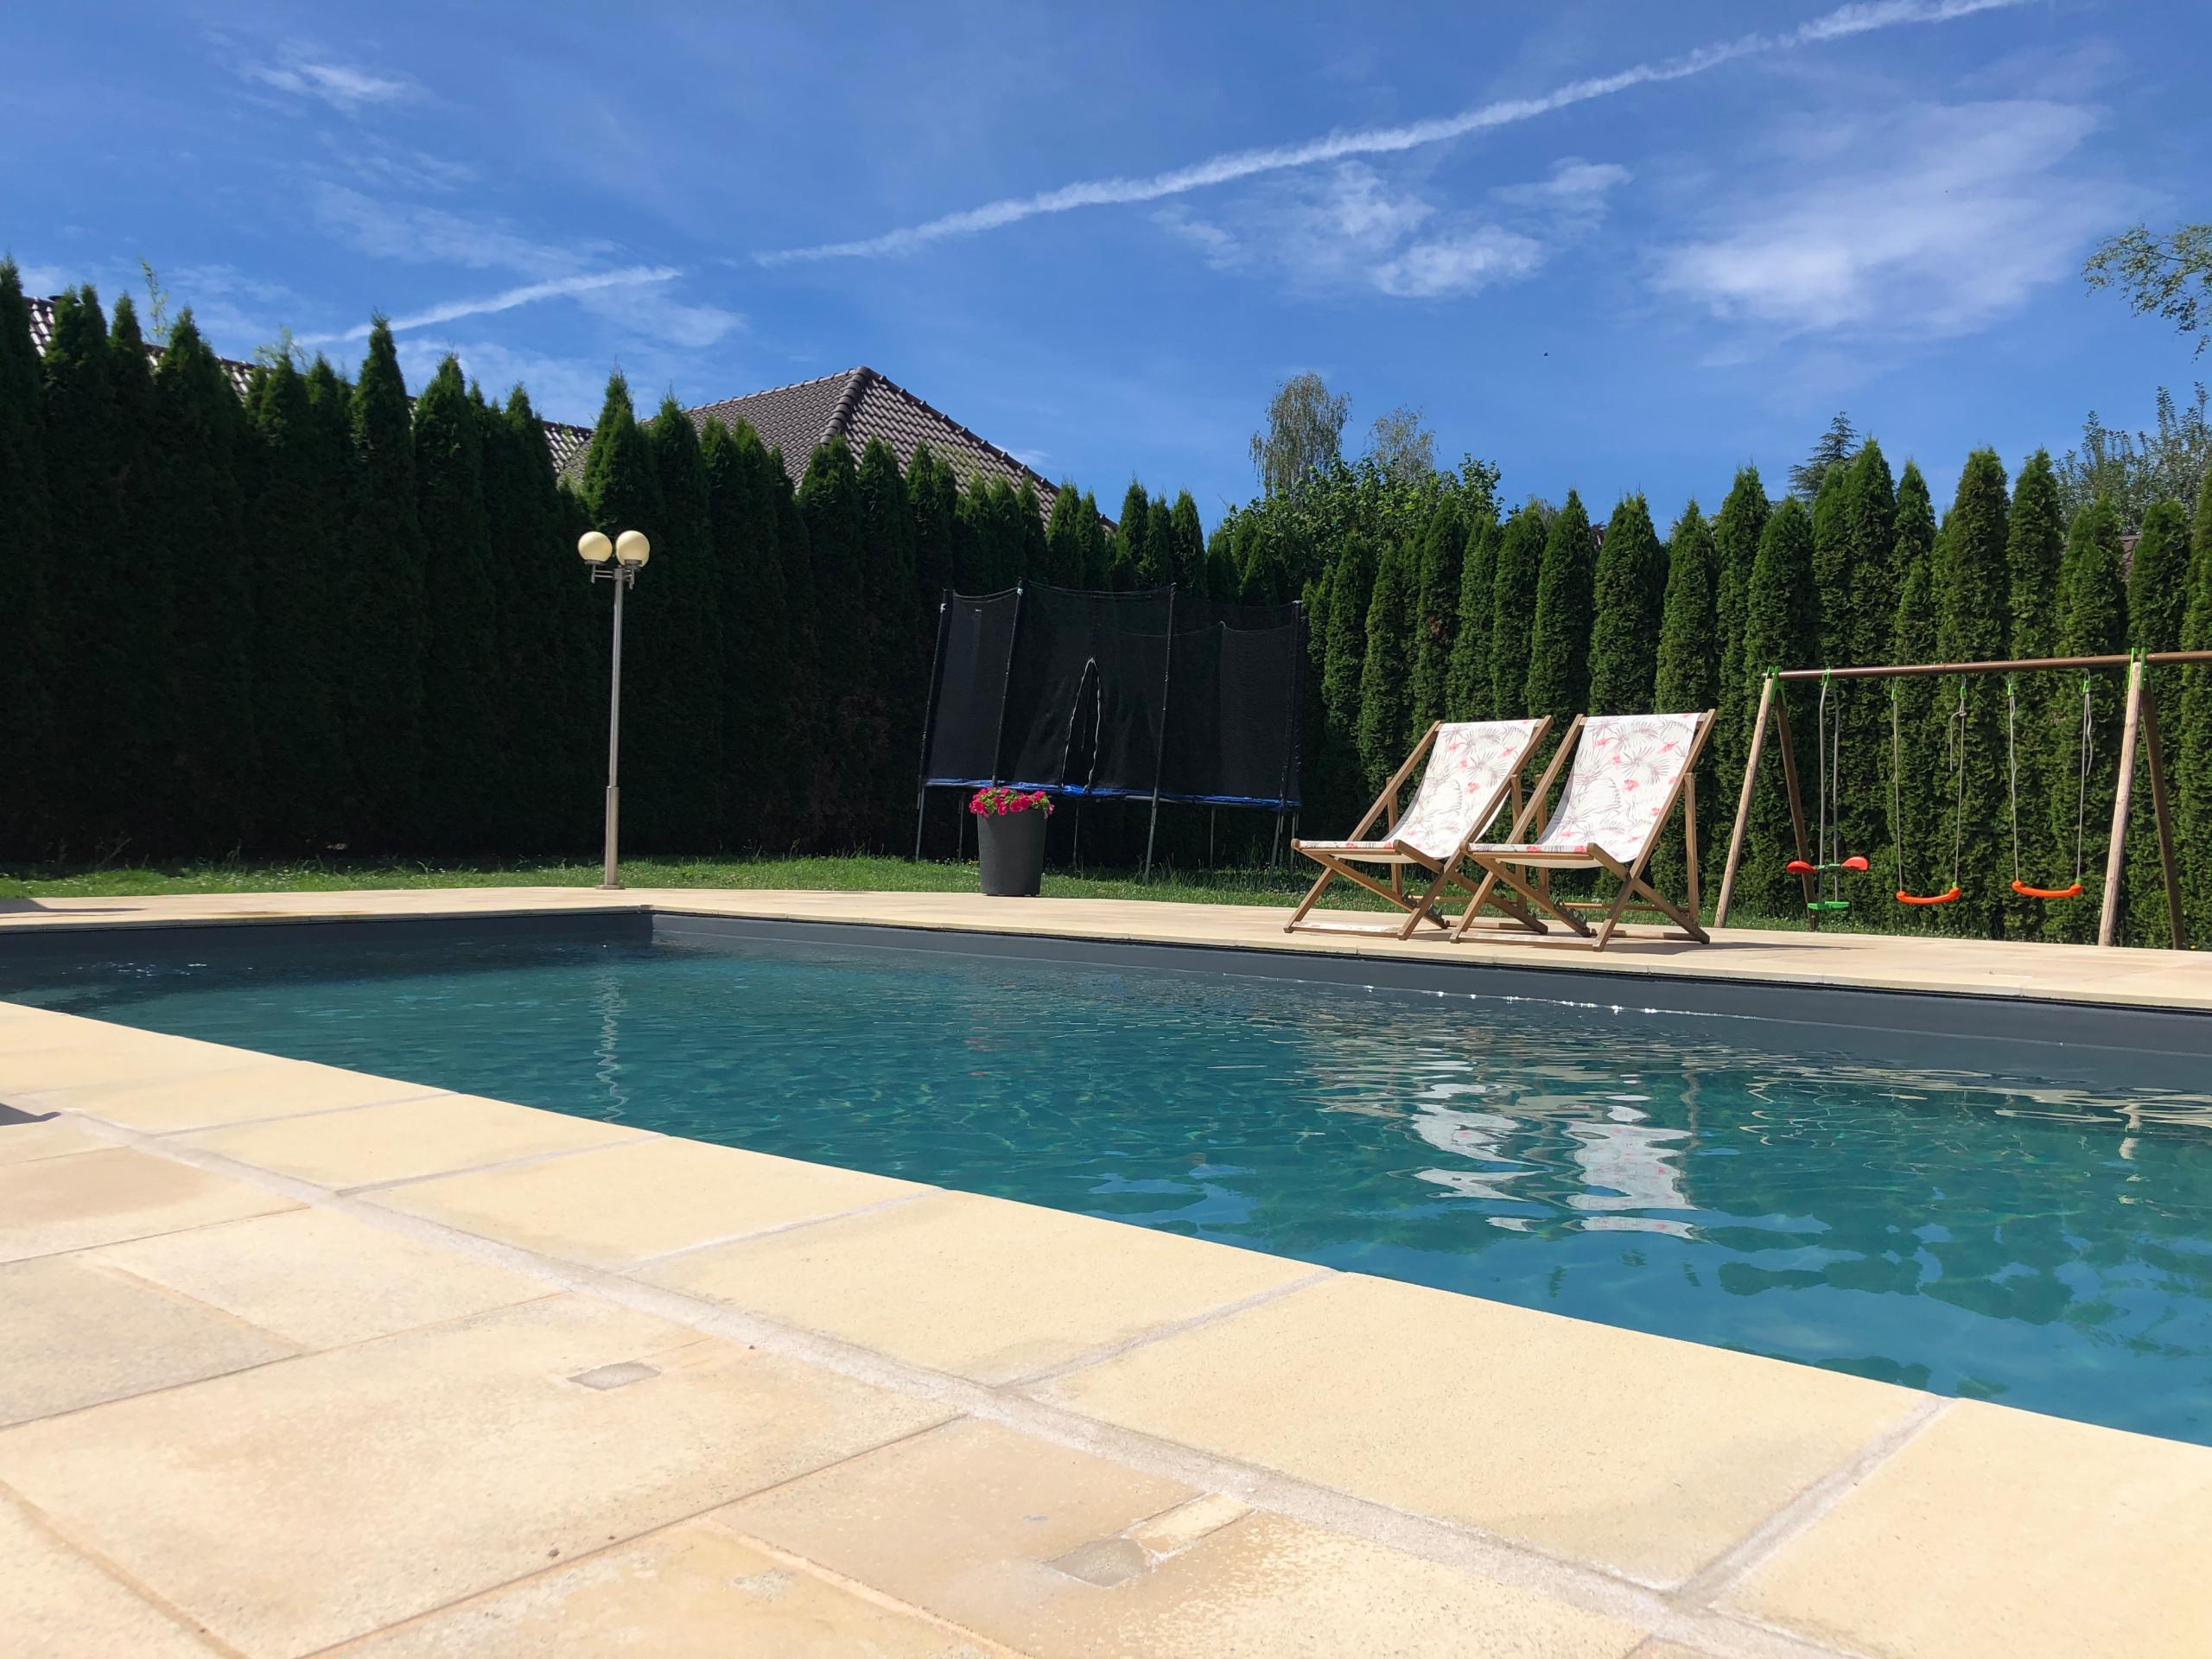 Pool Staging piscine extérieur liner gris anthracite